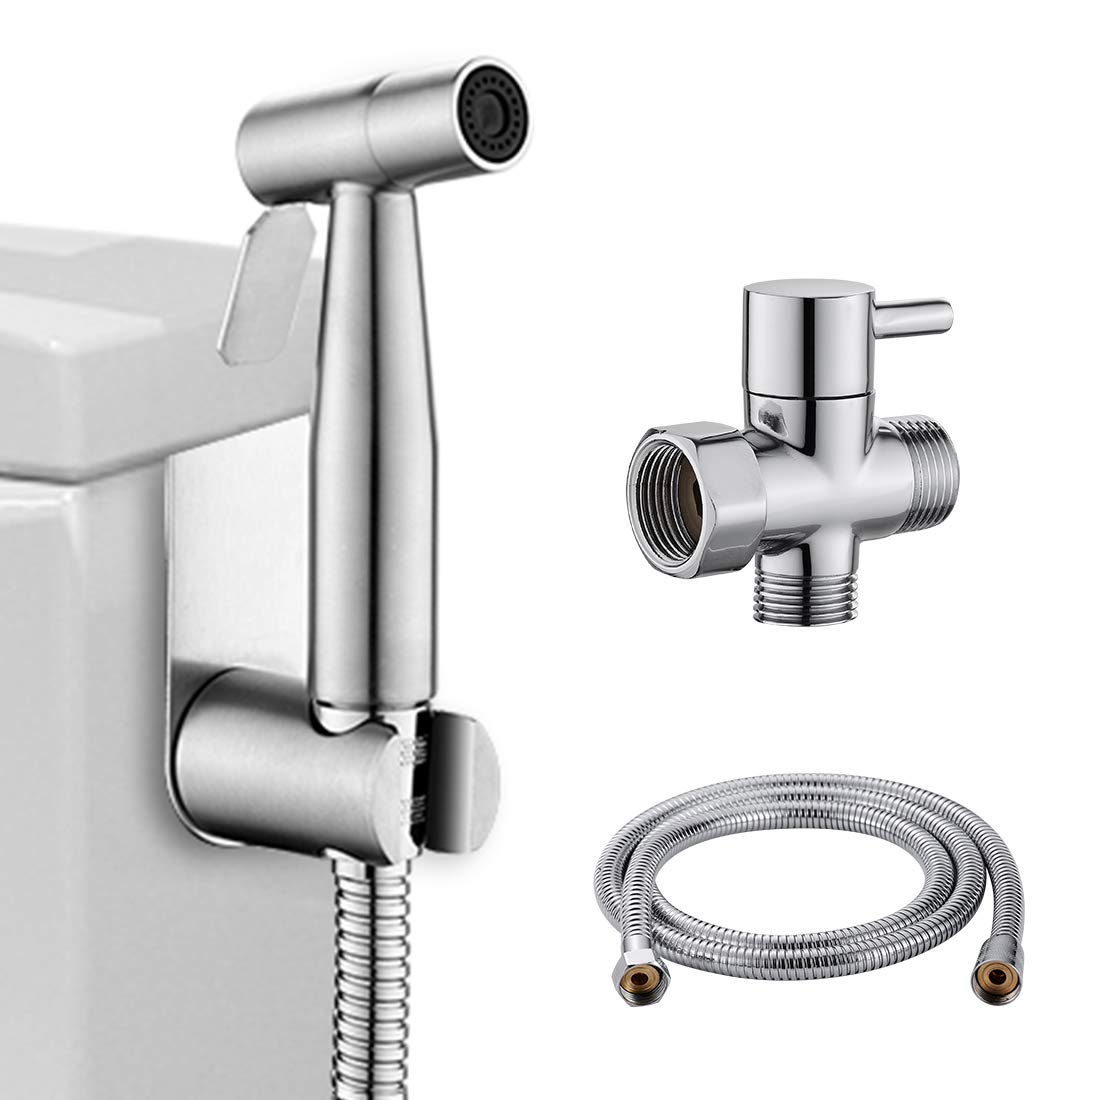 LIKAMU Stainless Steel Handheld Bidet, Bushed Nickle Hand Held Bidet Sprayer Cloth Diaper Sprayer Kits for Toilet, Bathroom, Kitchen